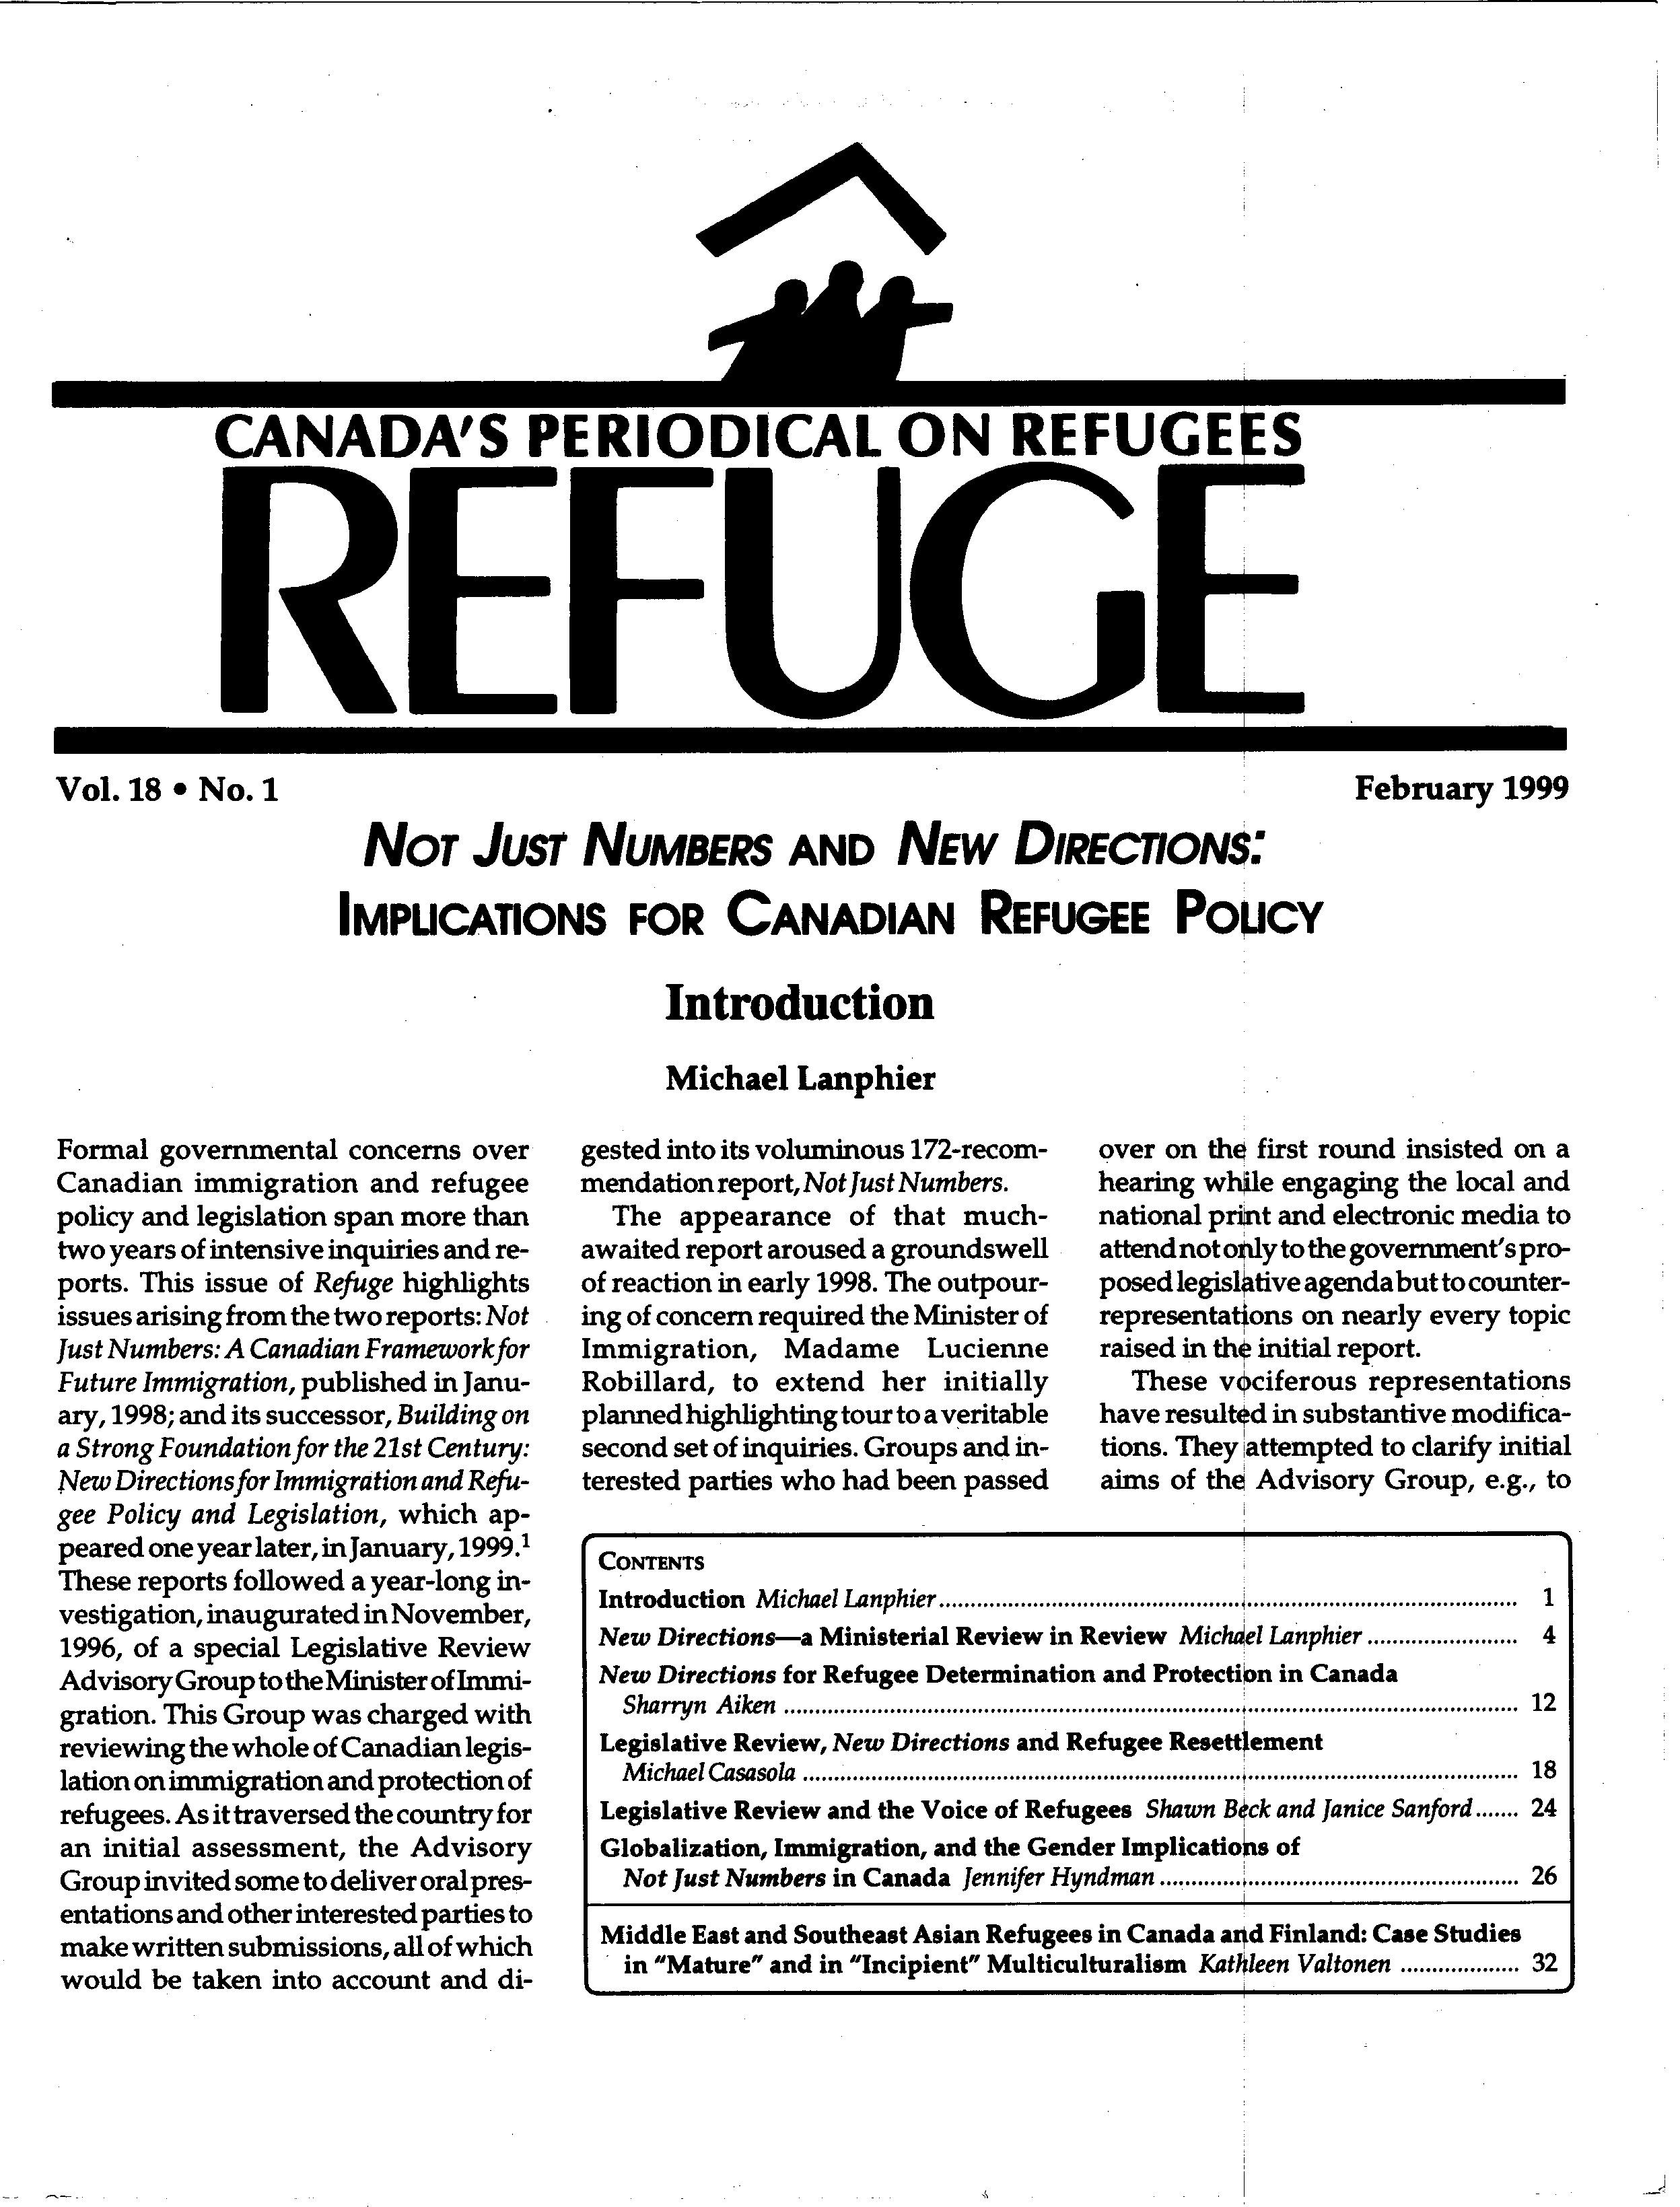 first page Refuge vol. 18.1 1999